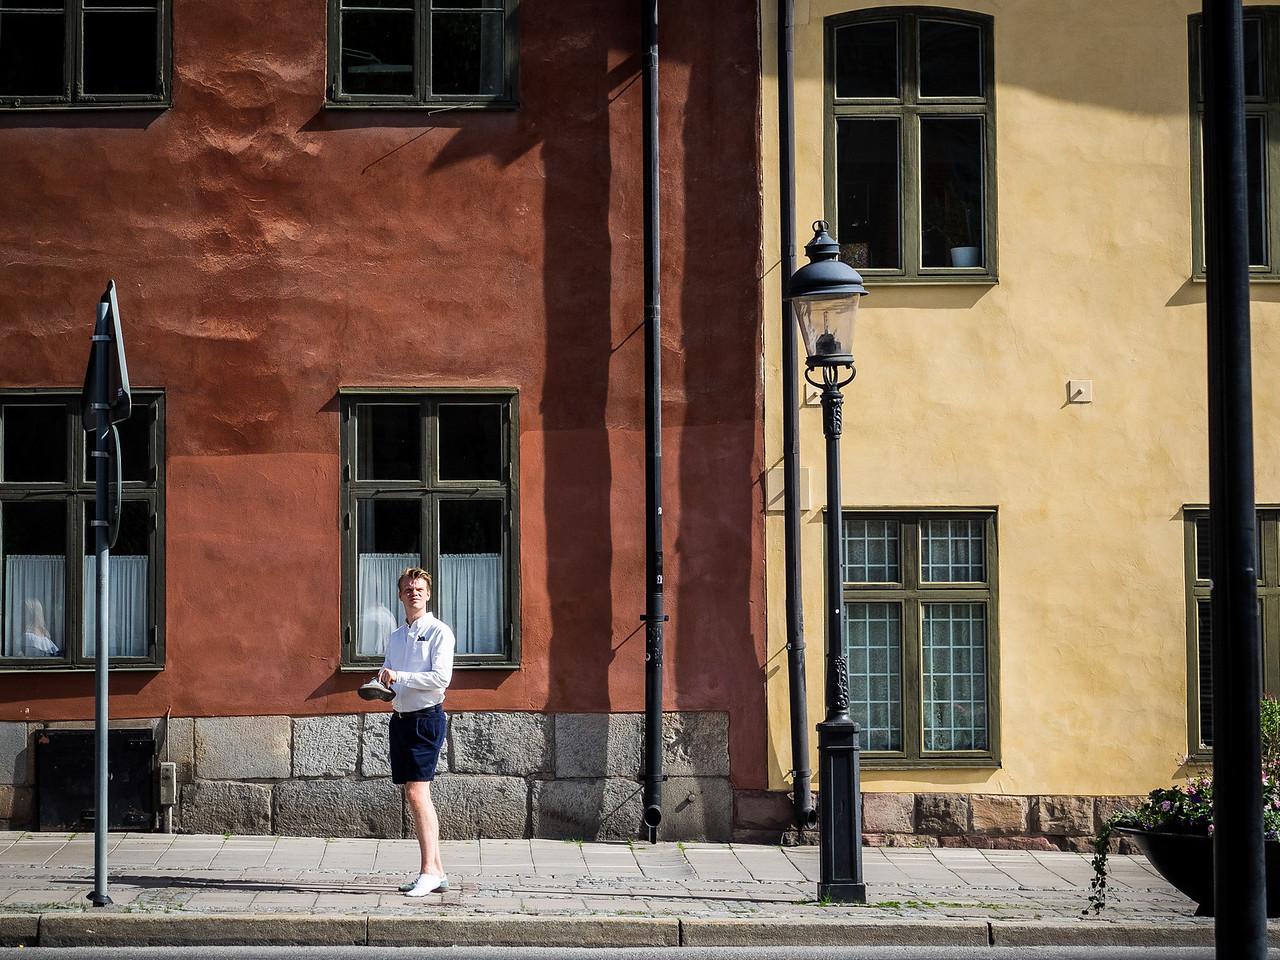 Shoeless in Stockholm